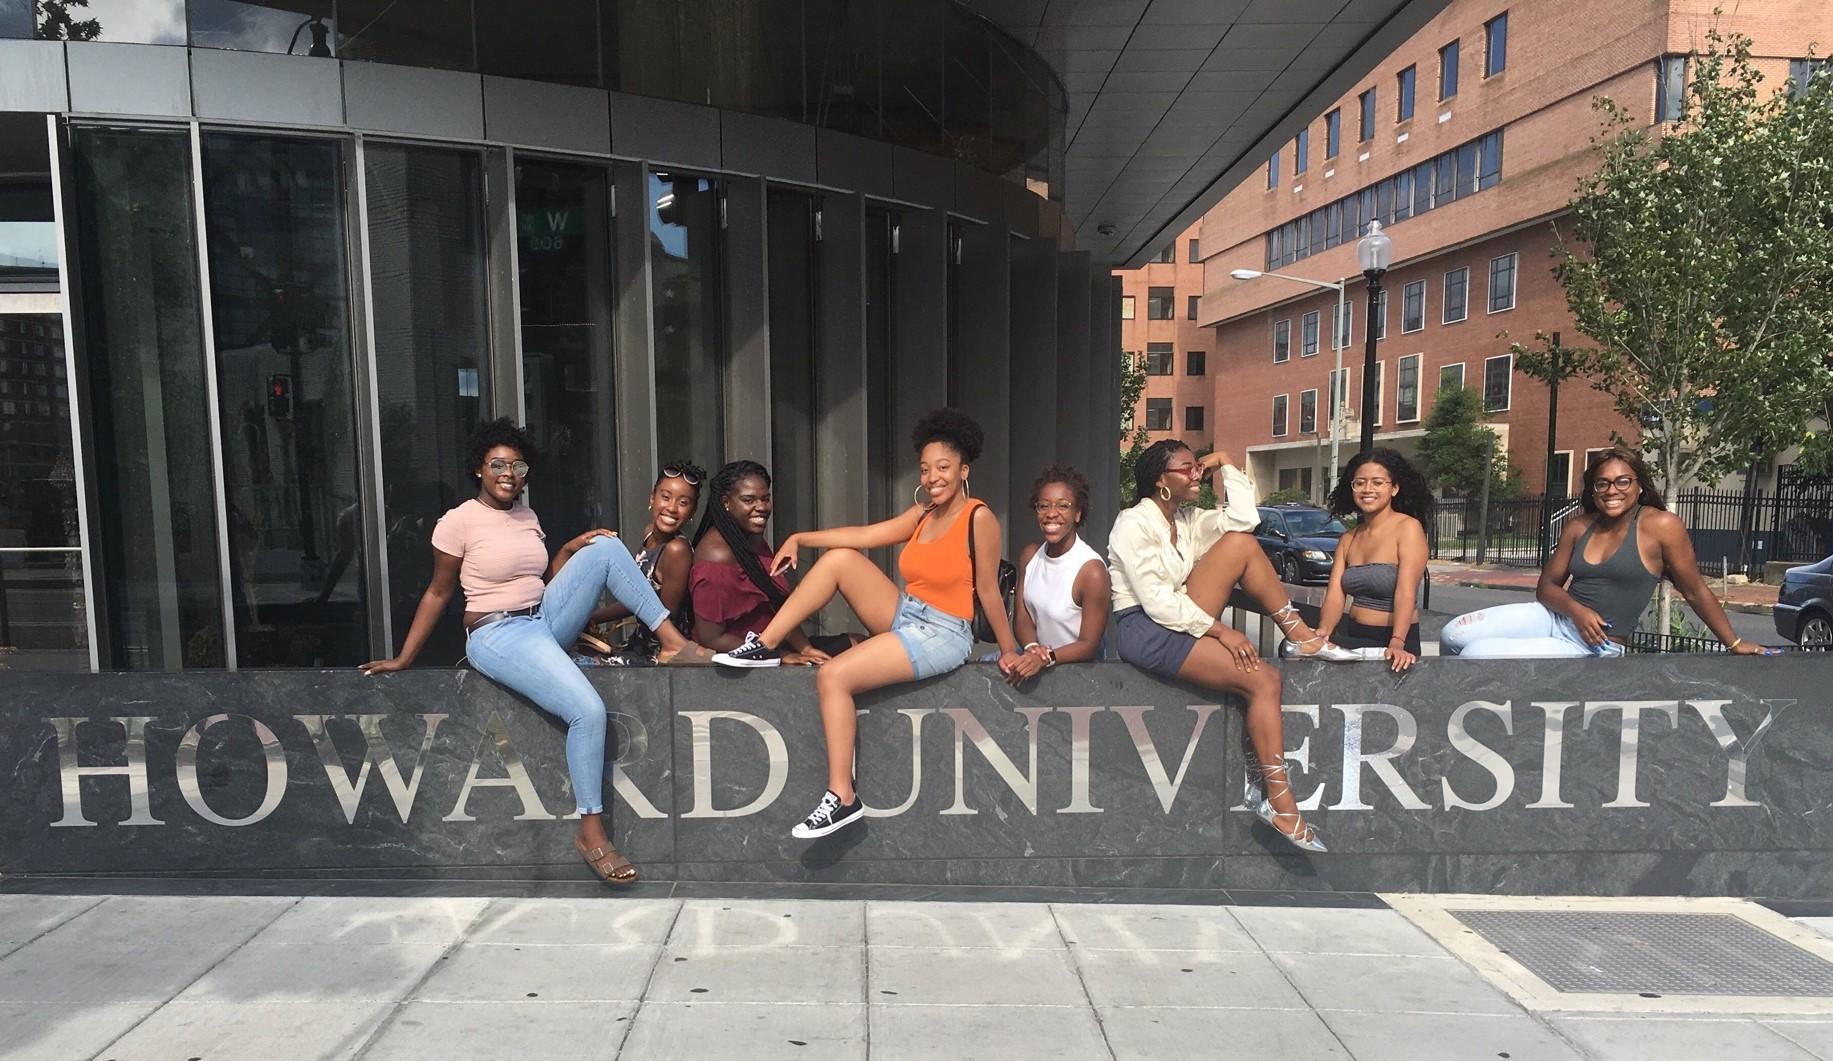 Howard-University-2021-Class-HU21-Freshmen.jpg